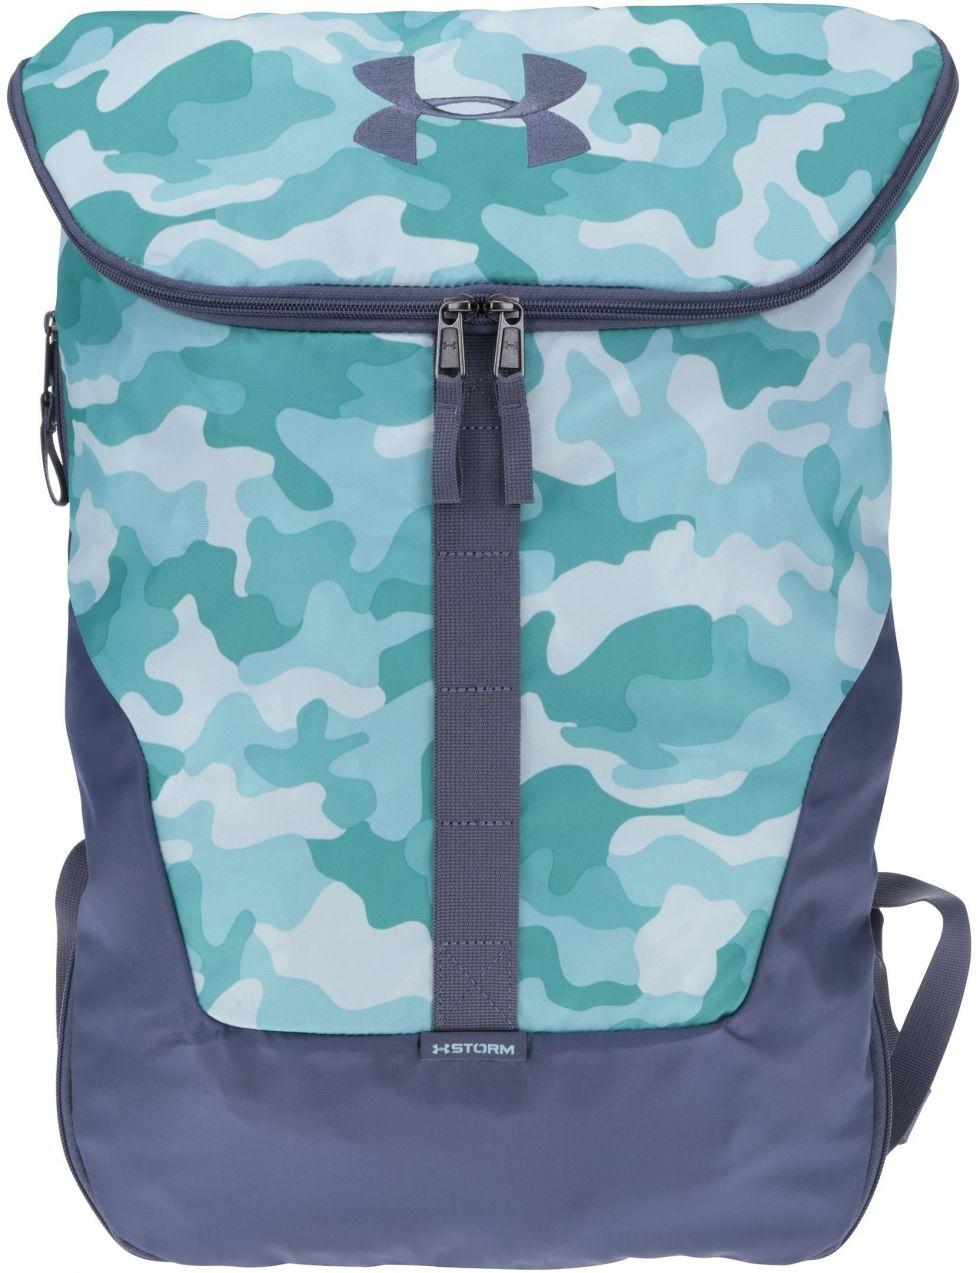 Sivo-tyrkysový dámsky vzorovaný batoh Under Armour značky UNDER ARMOUR -  Lovely.sk 9fce05faaf